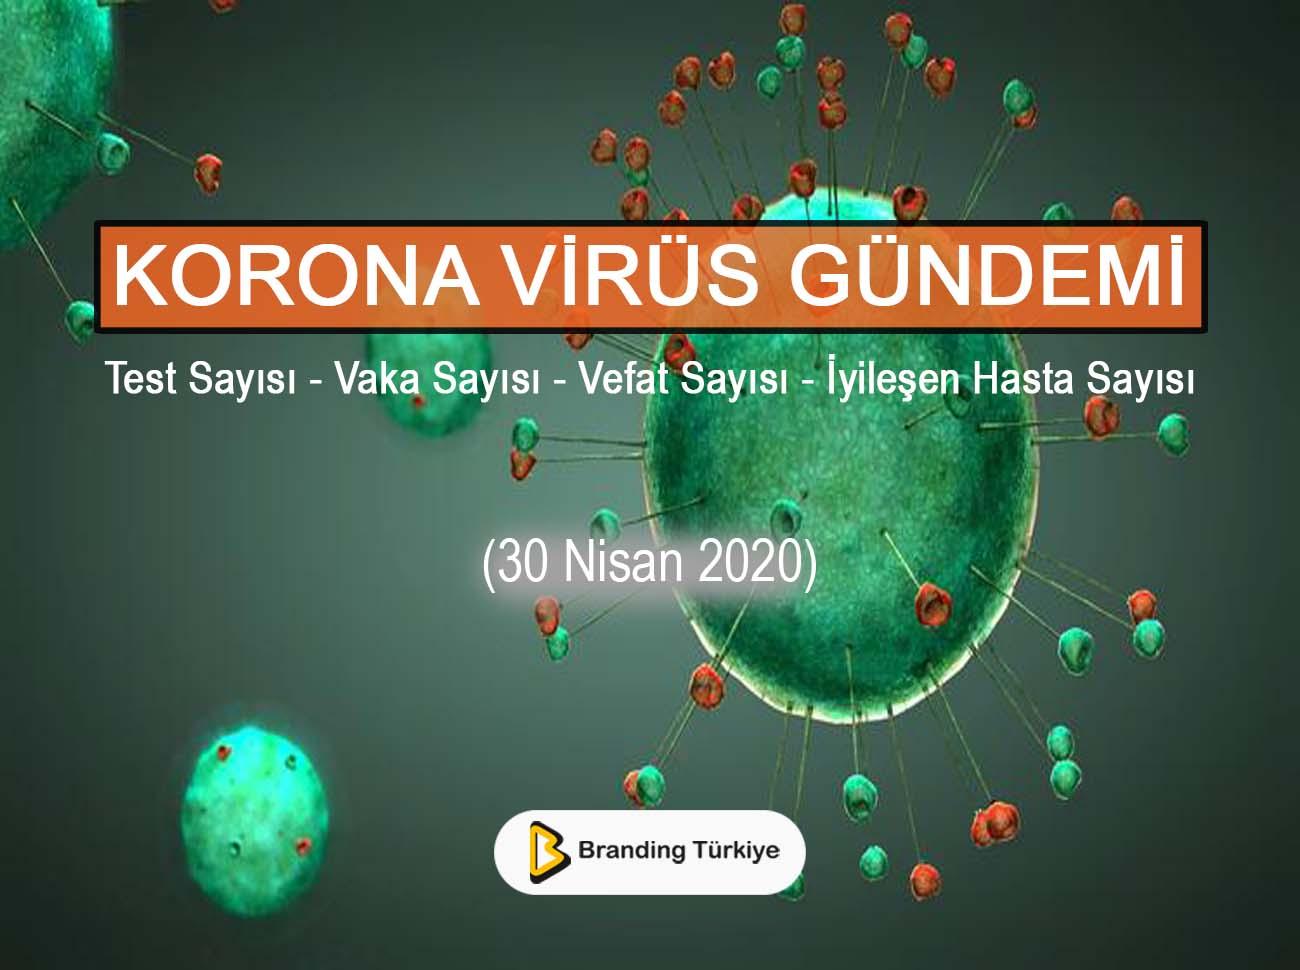 Korona Virüs Gündemi (30 Nisan 2020)